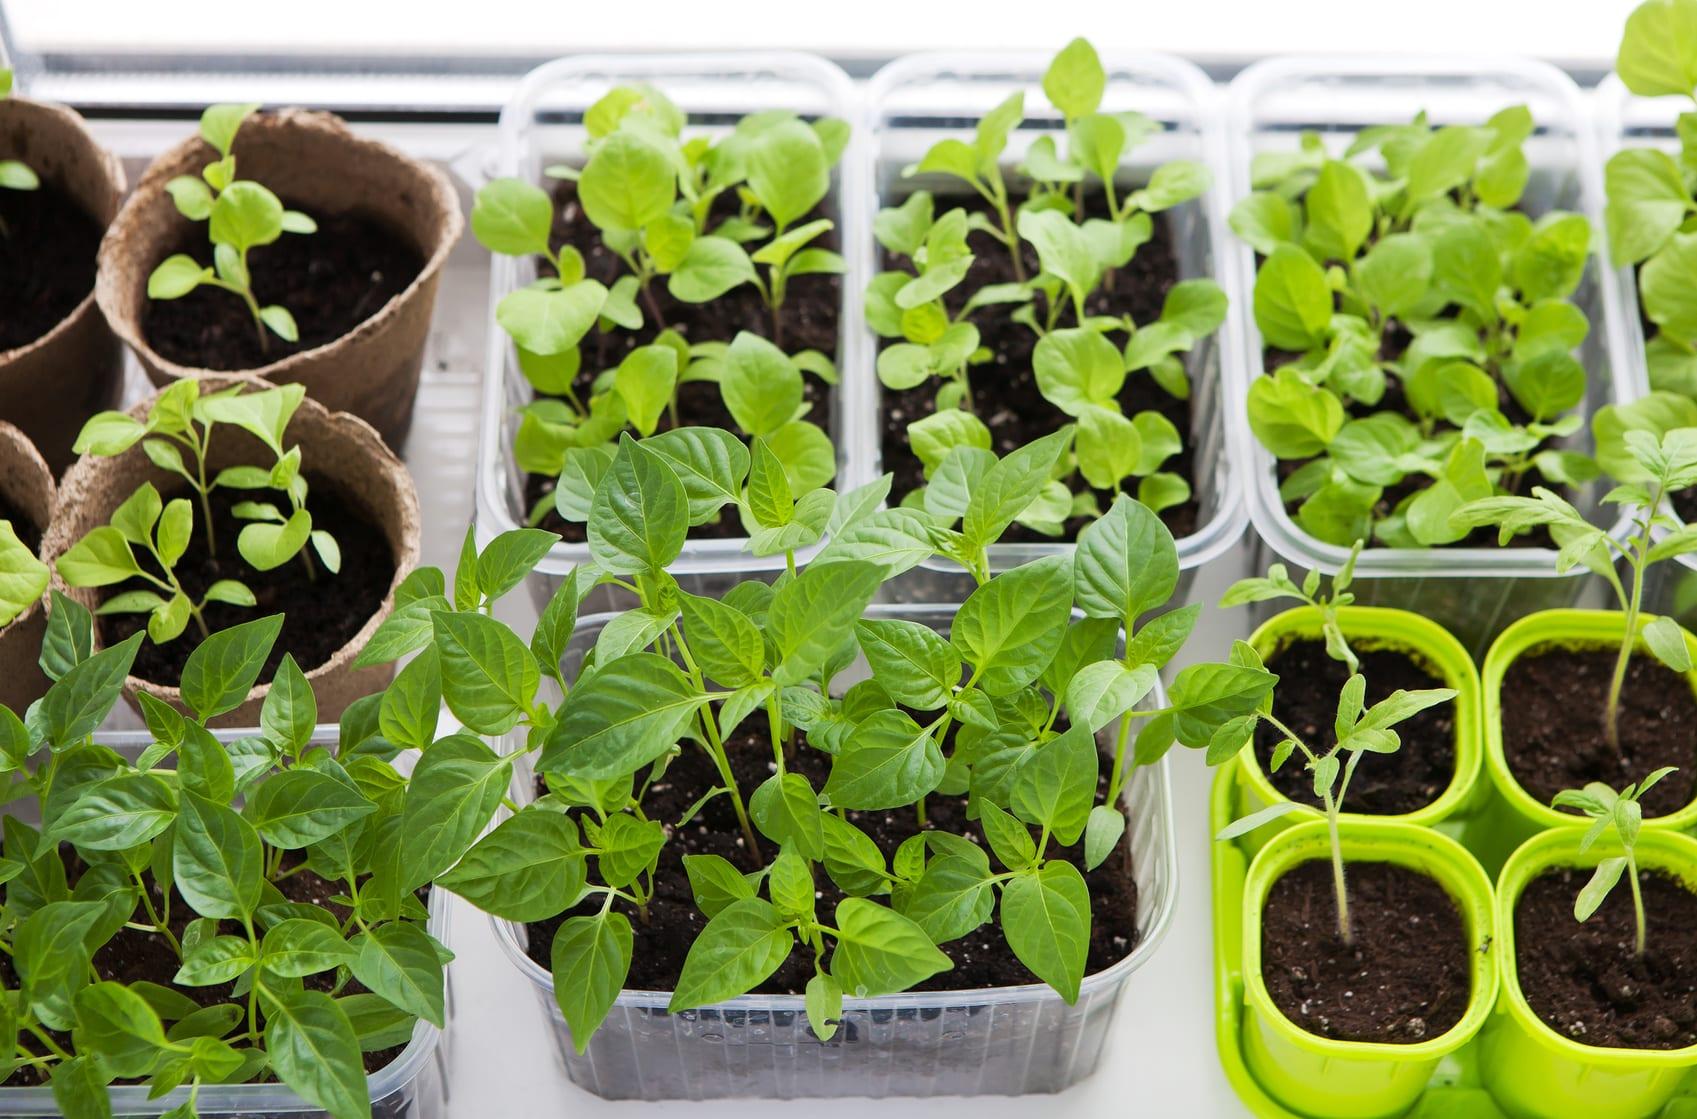 Vegetable seedligs indoor